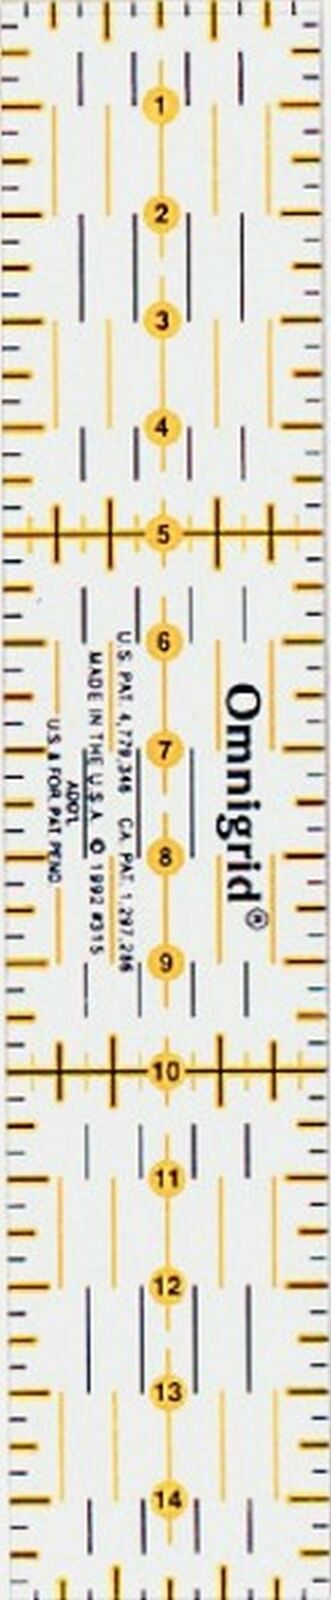 2 Bügellineale PRYM 611.937-1 Lineal 10x30cm und 1 Lineal 5x15cm